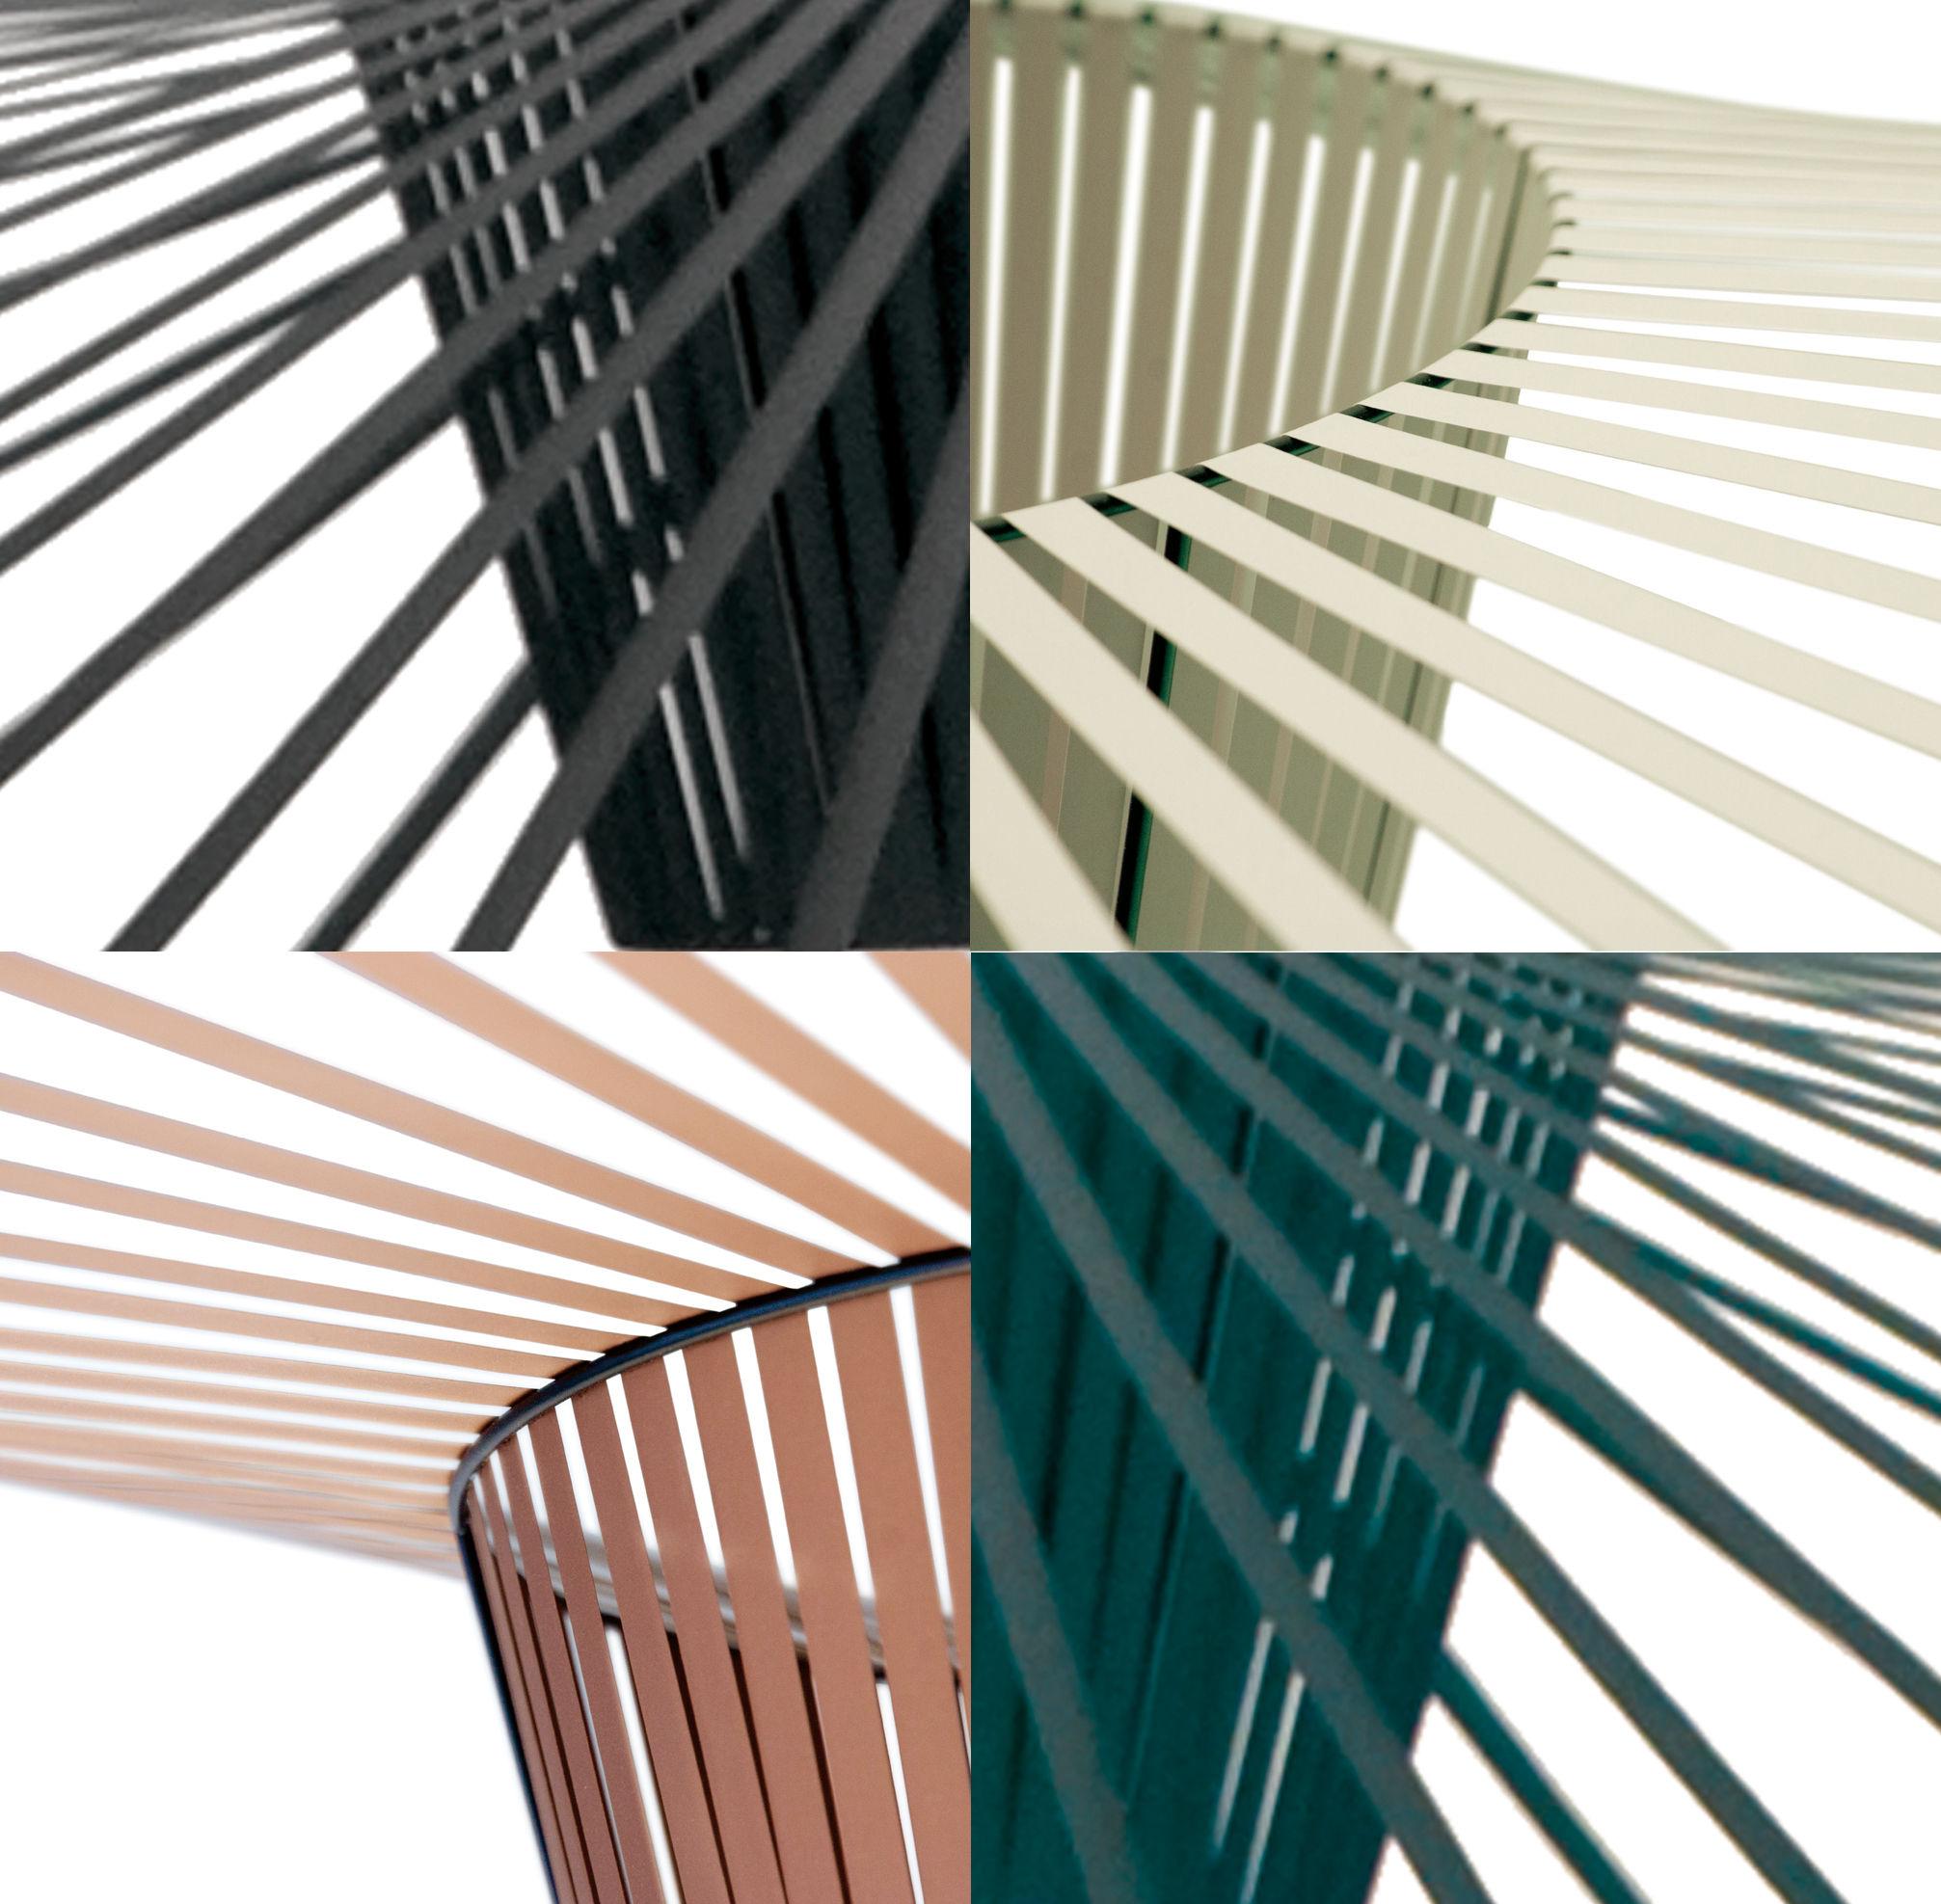 luminaire vertigo petite friture cuivre 200 cm made. Black Bedroom Furniture Sets. Home Design Ideas